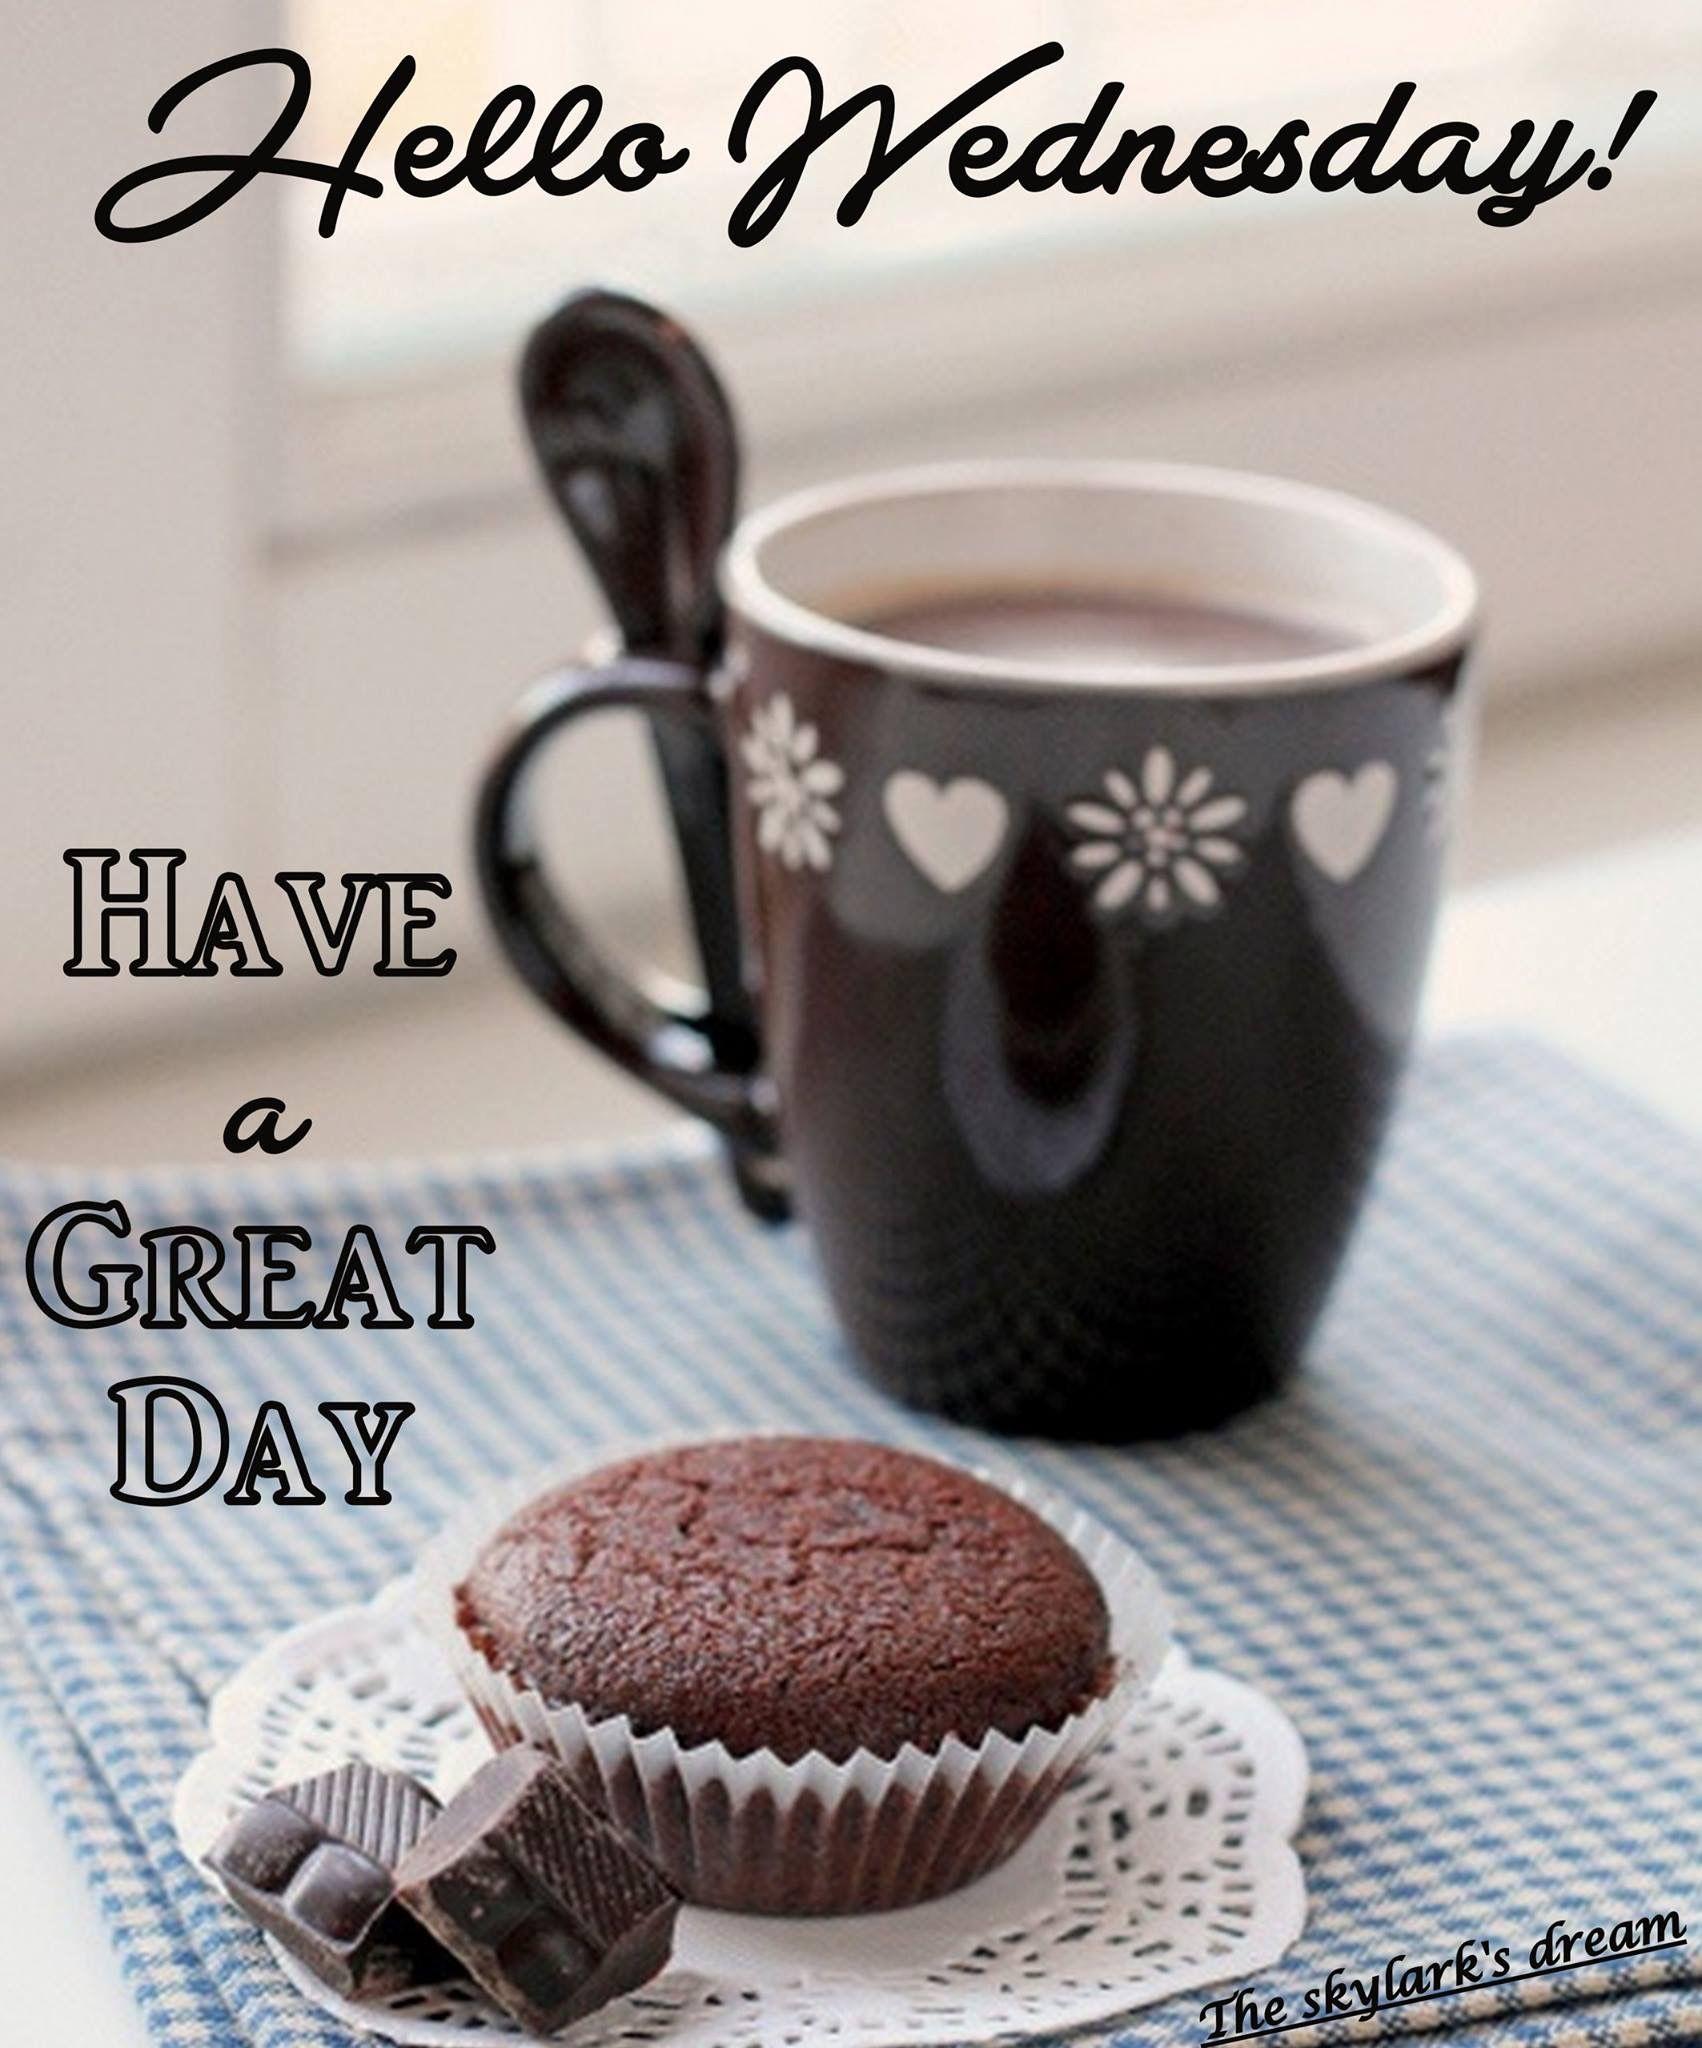 Hello Wednesday Images : hello, wednesday, images, Great, Wednesday, ❤️, Morning, Wednesday,, Coffee,